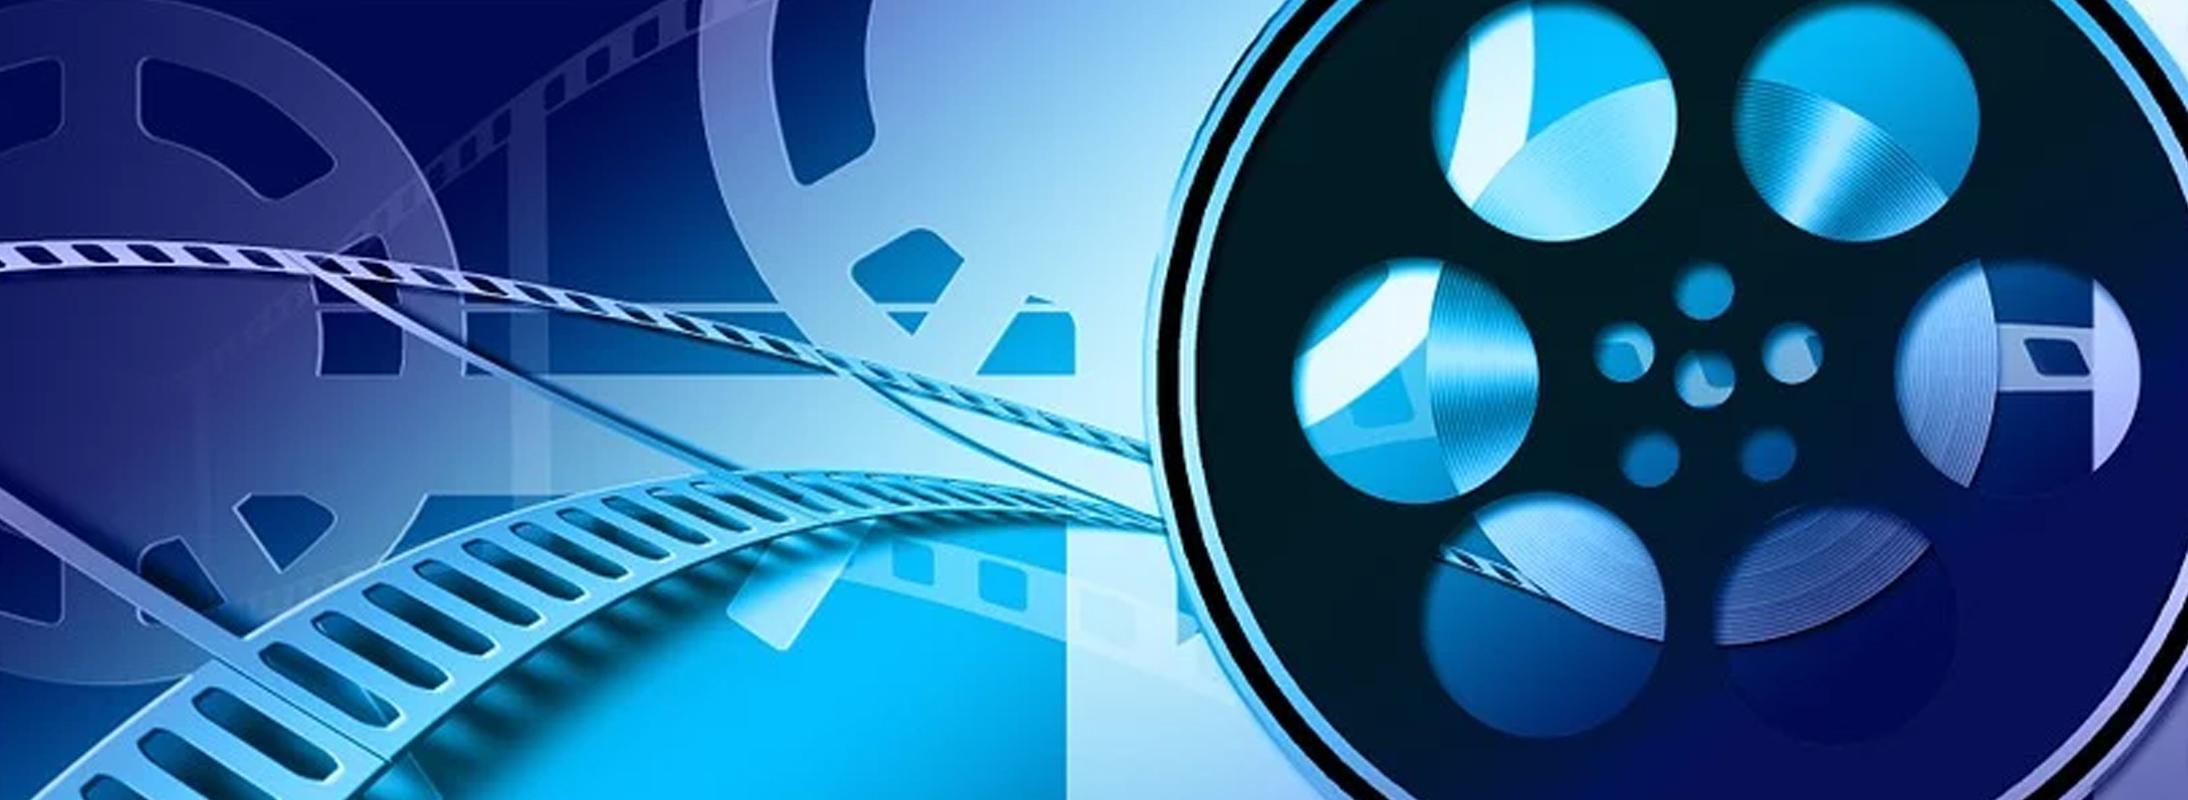 The Best Movie Slot Games element01 - CasinoTop